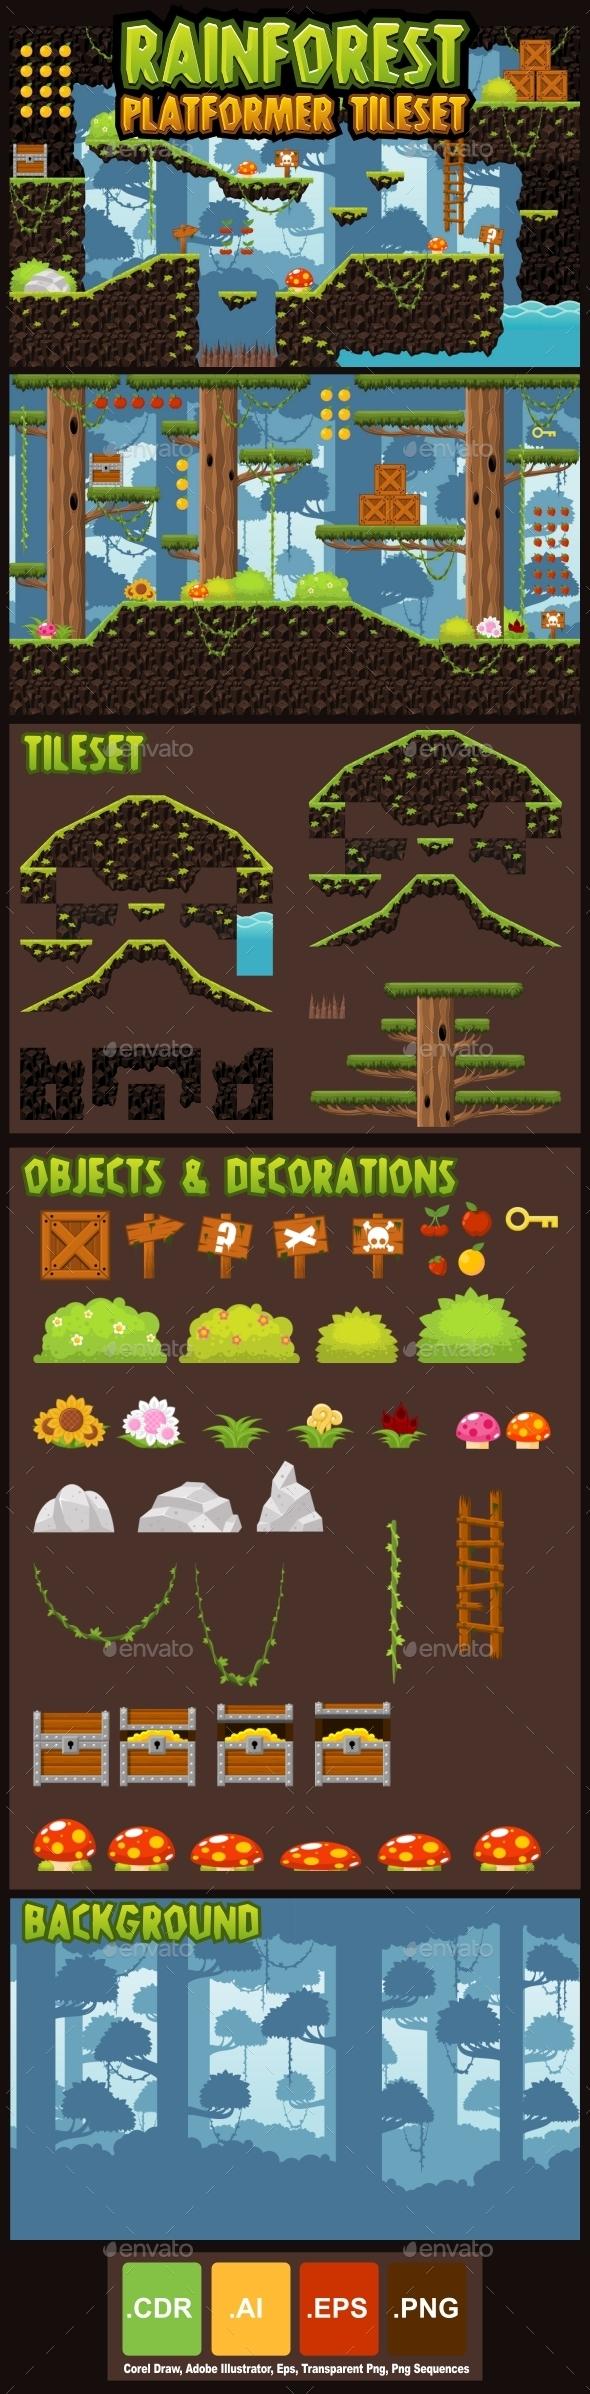 Rainforest Platformer Tileset - Tilesets Game Assets